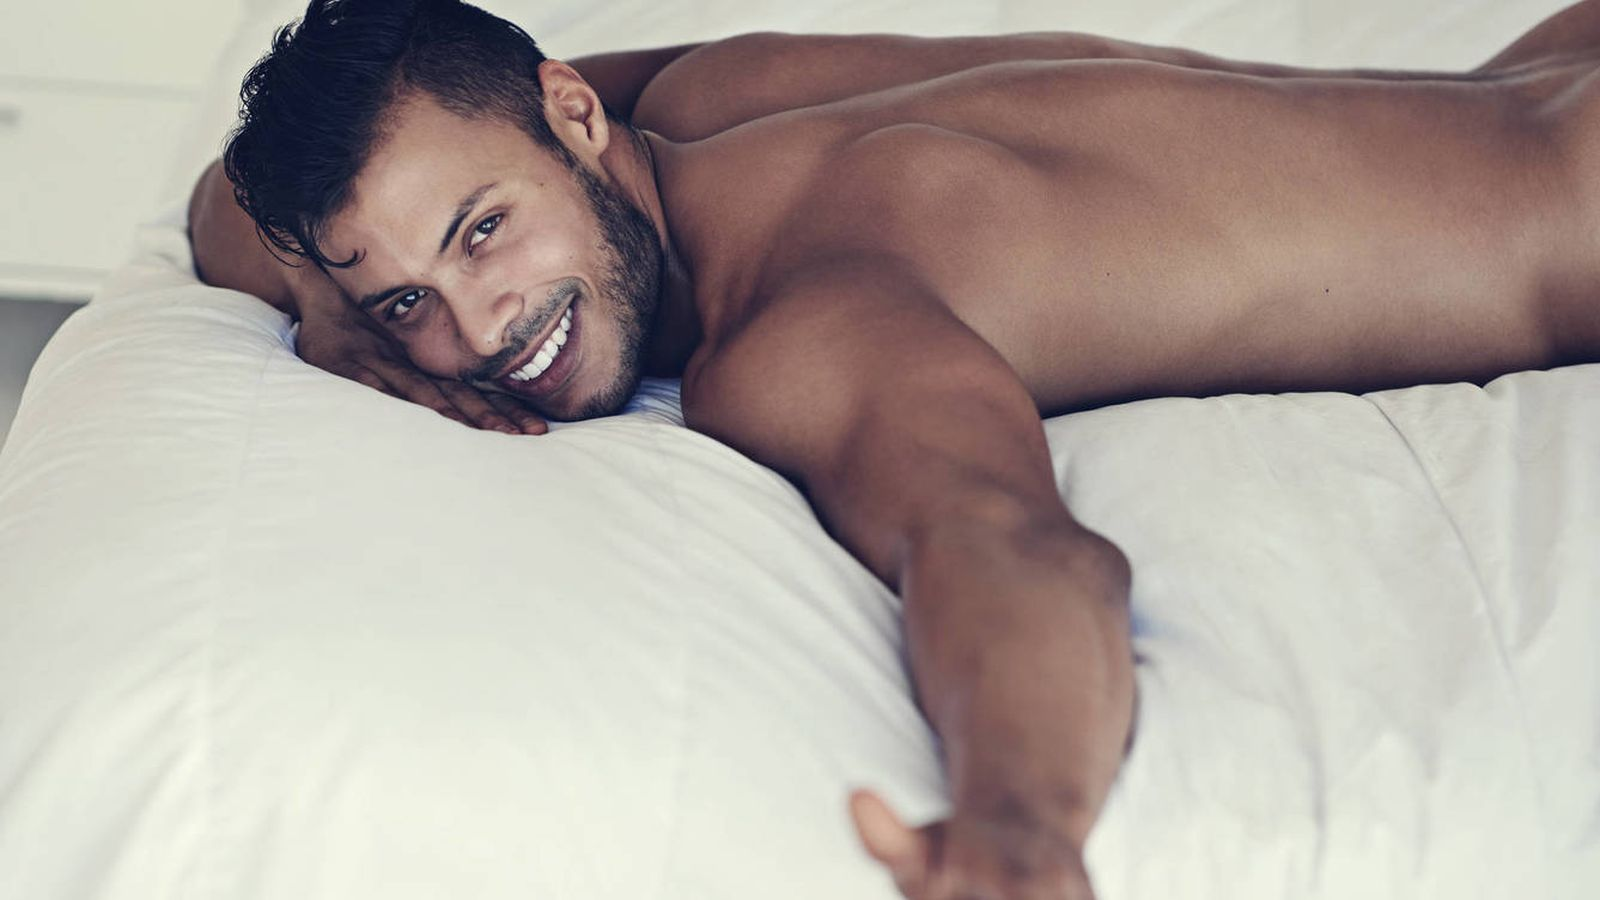 www videos porno com gay madrid escort